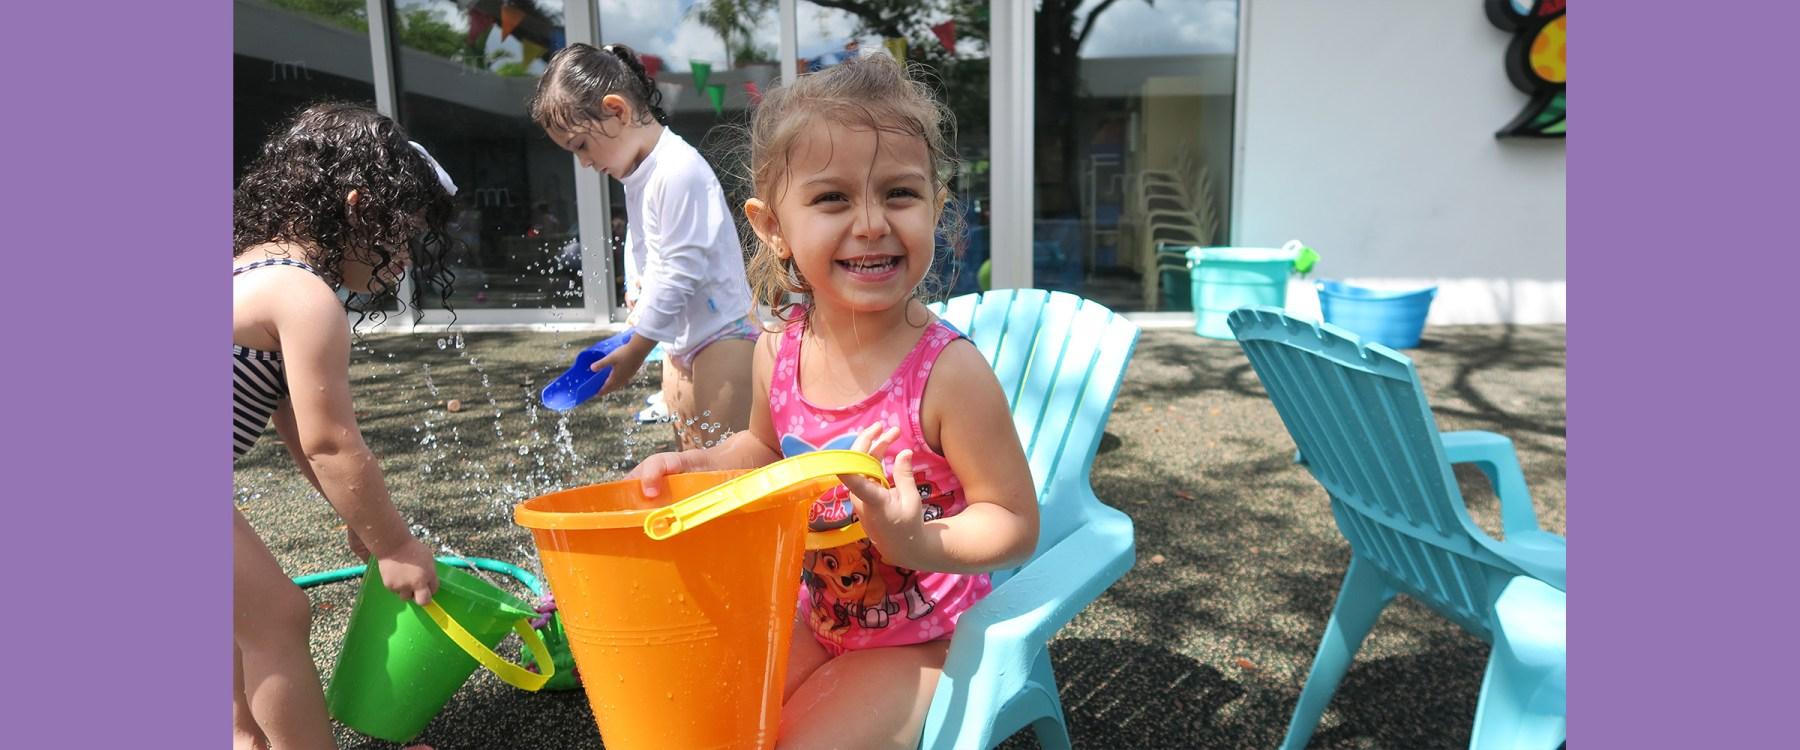 PreK, Preschool in Coconut Grove, Coral Gables, Pinecrest, South Miami